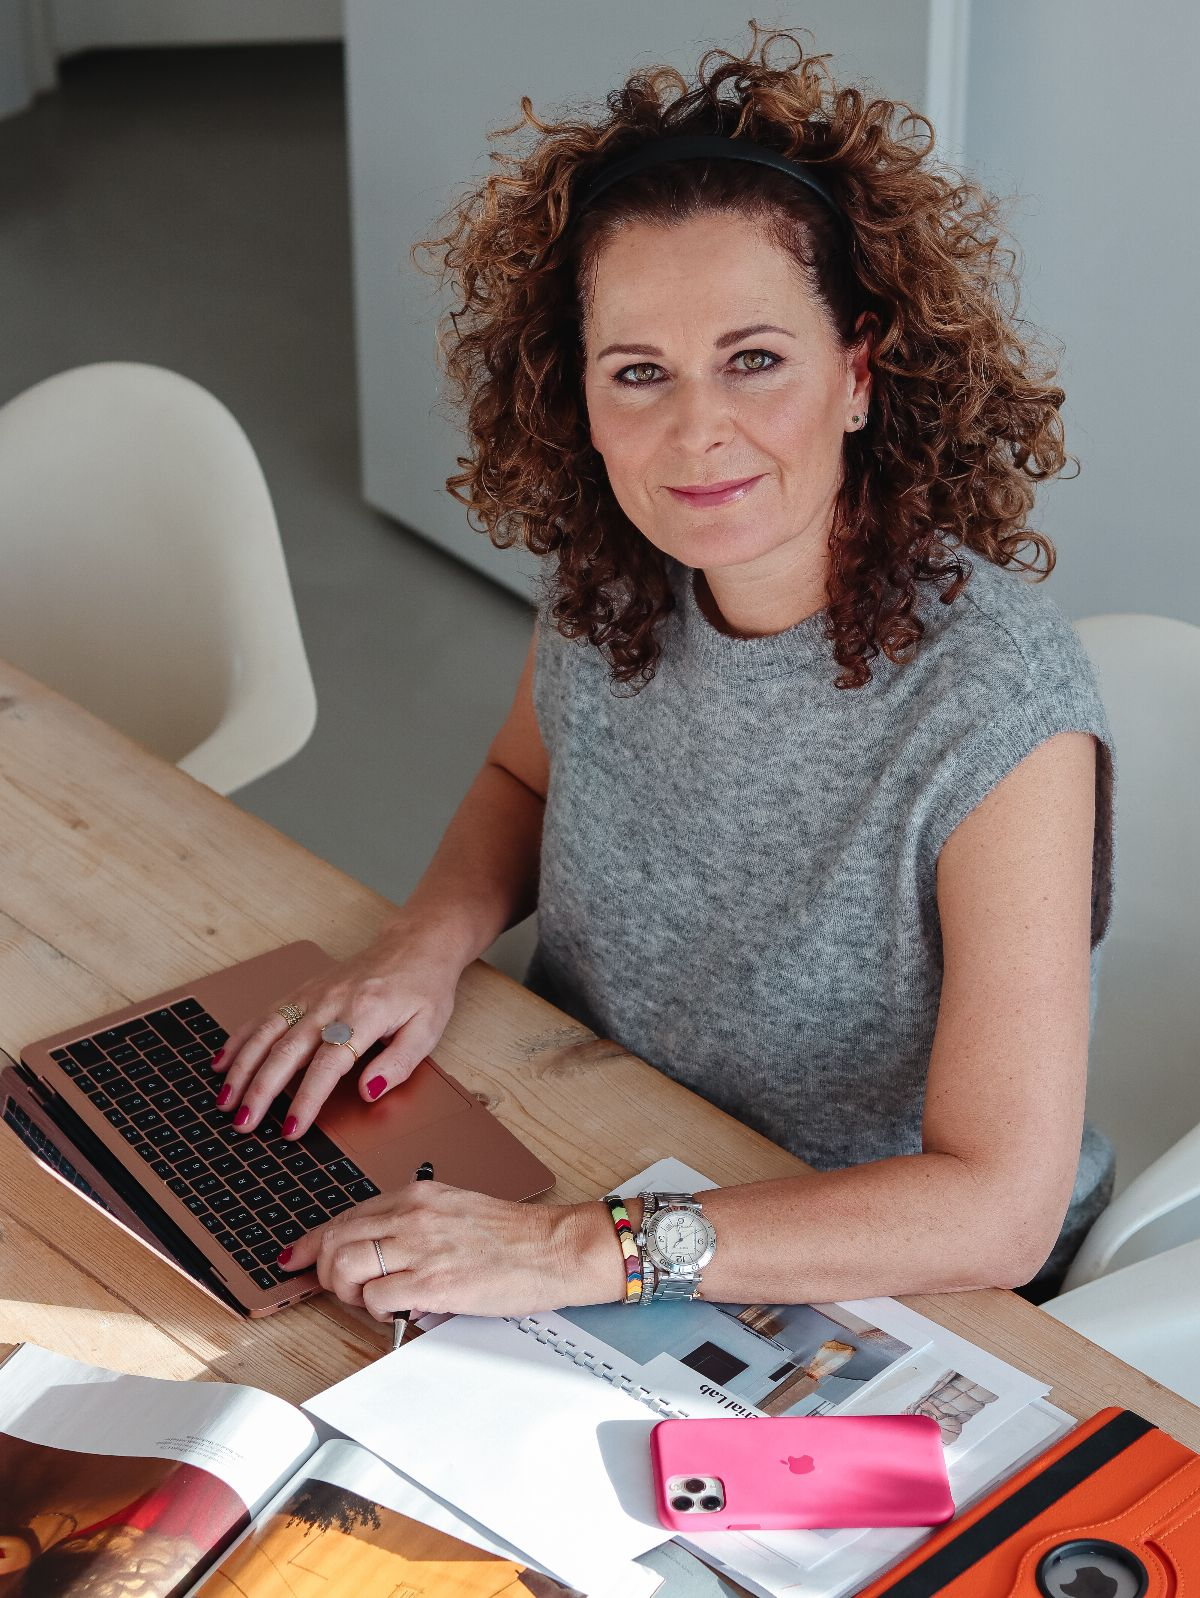 Paula Terpstra Websitecoaching Danielle-vanDongen-77-web